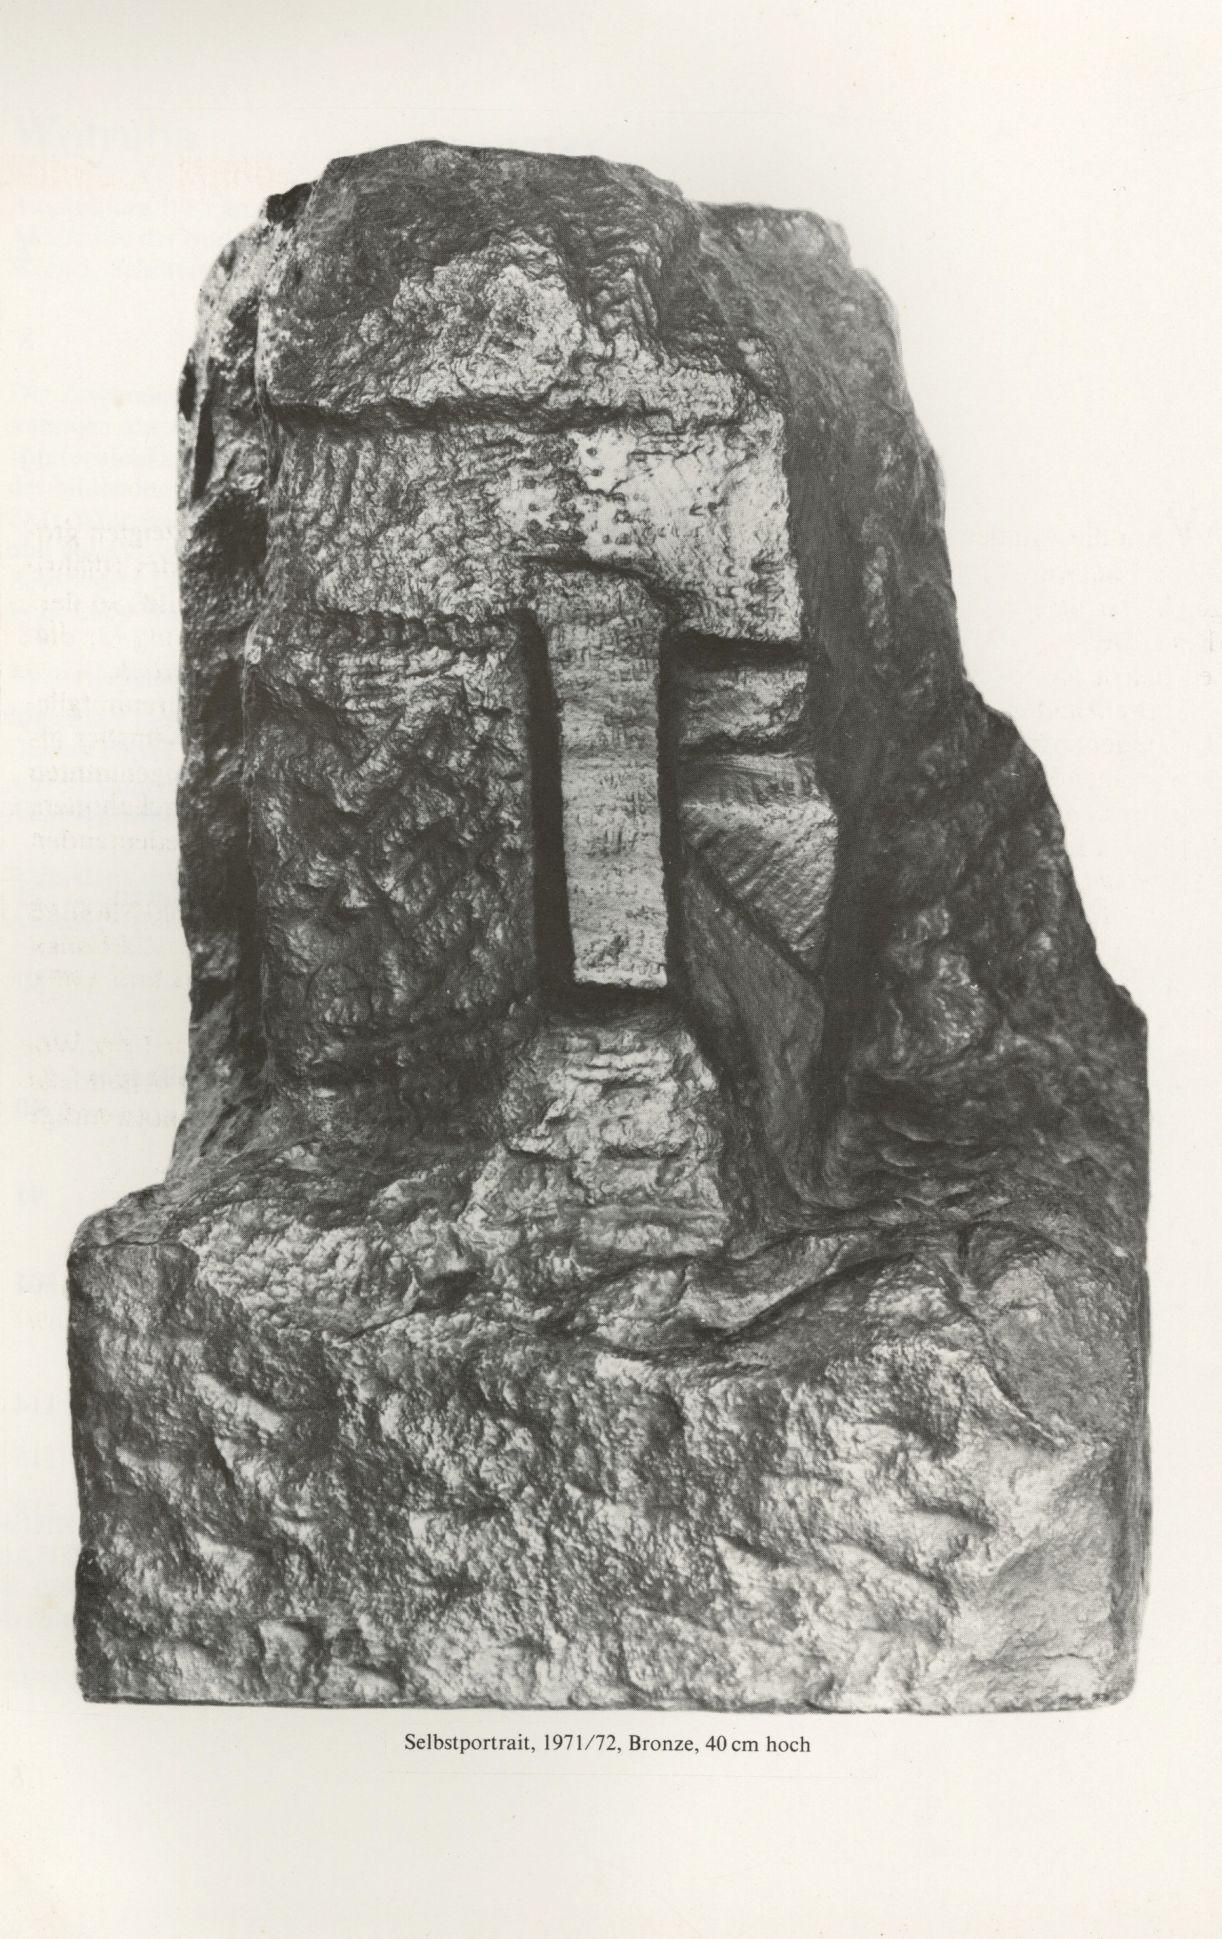 Fritz Wotruba, 'Autorretrato', 1971-1972, bronze, 40 cm